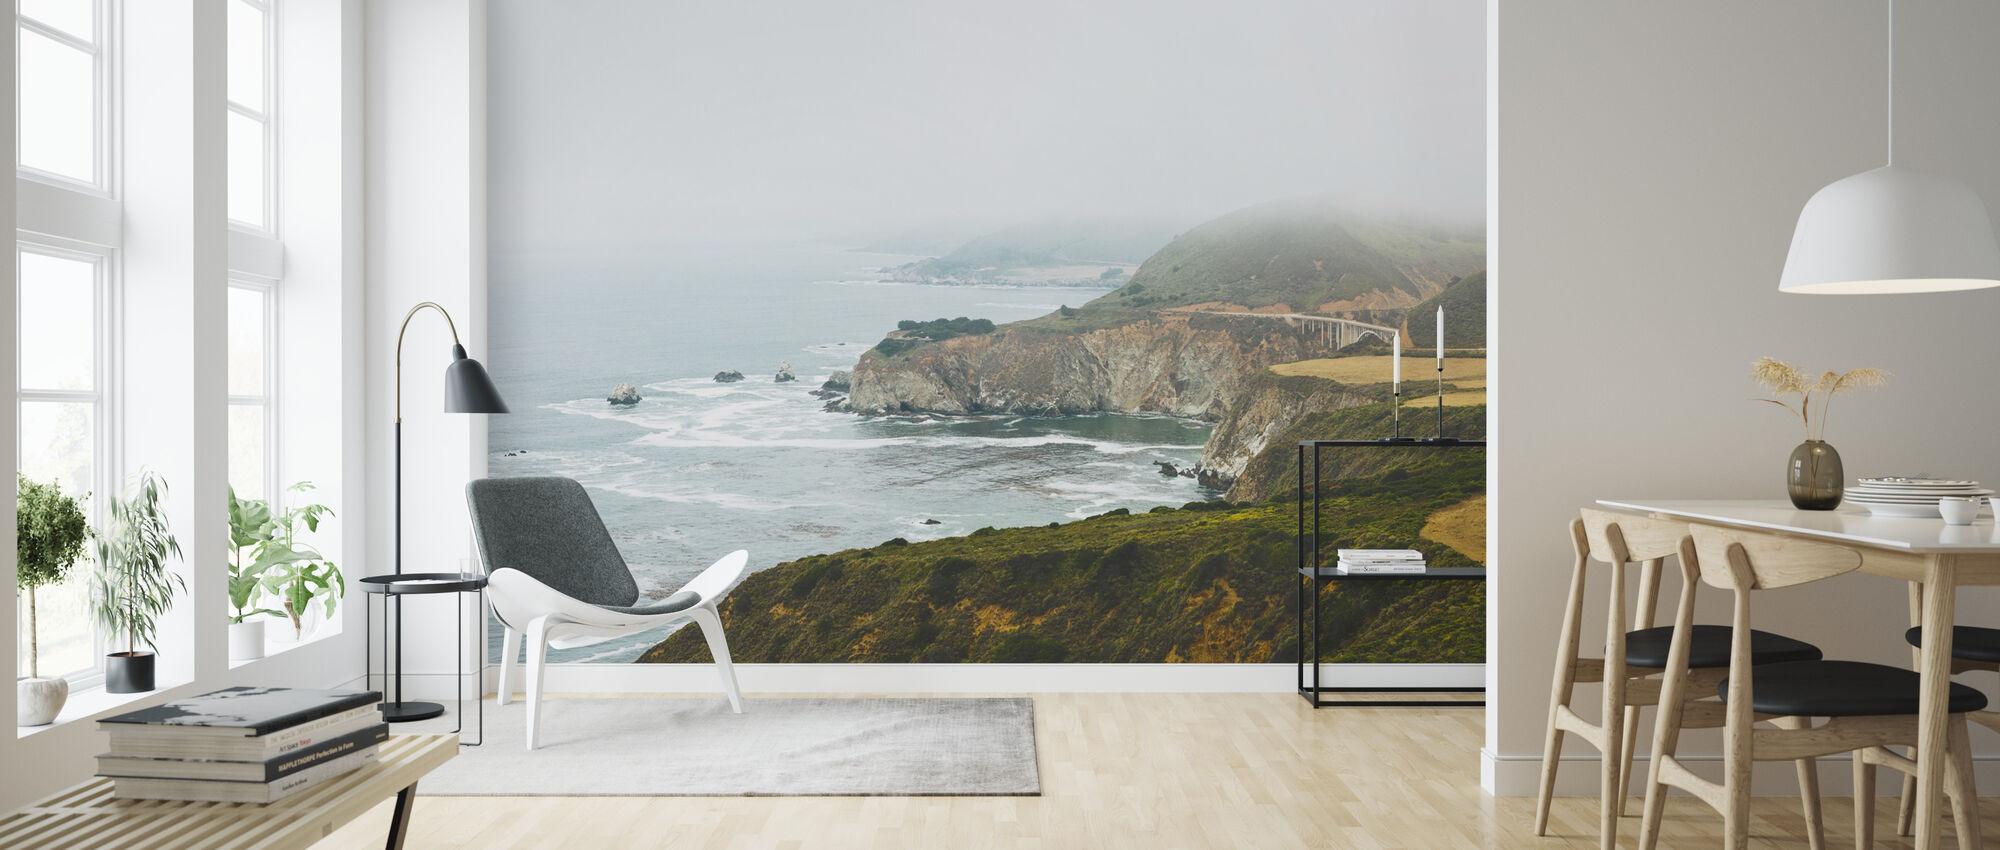 View of Bixby Bridge, California - Wallpaper - Living Room